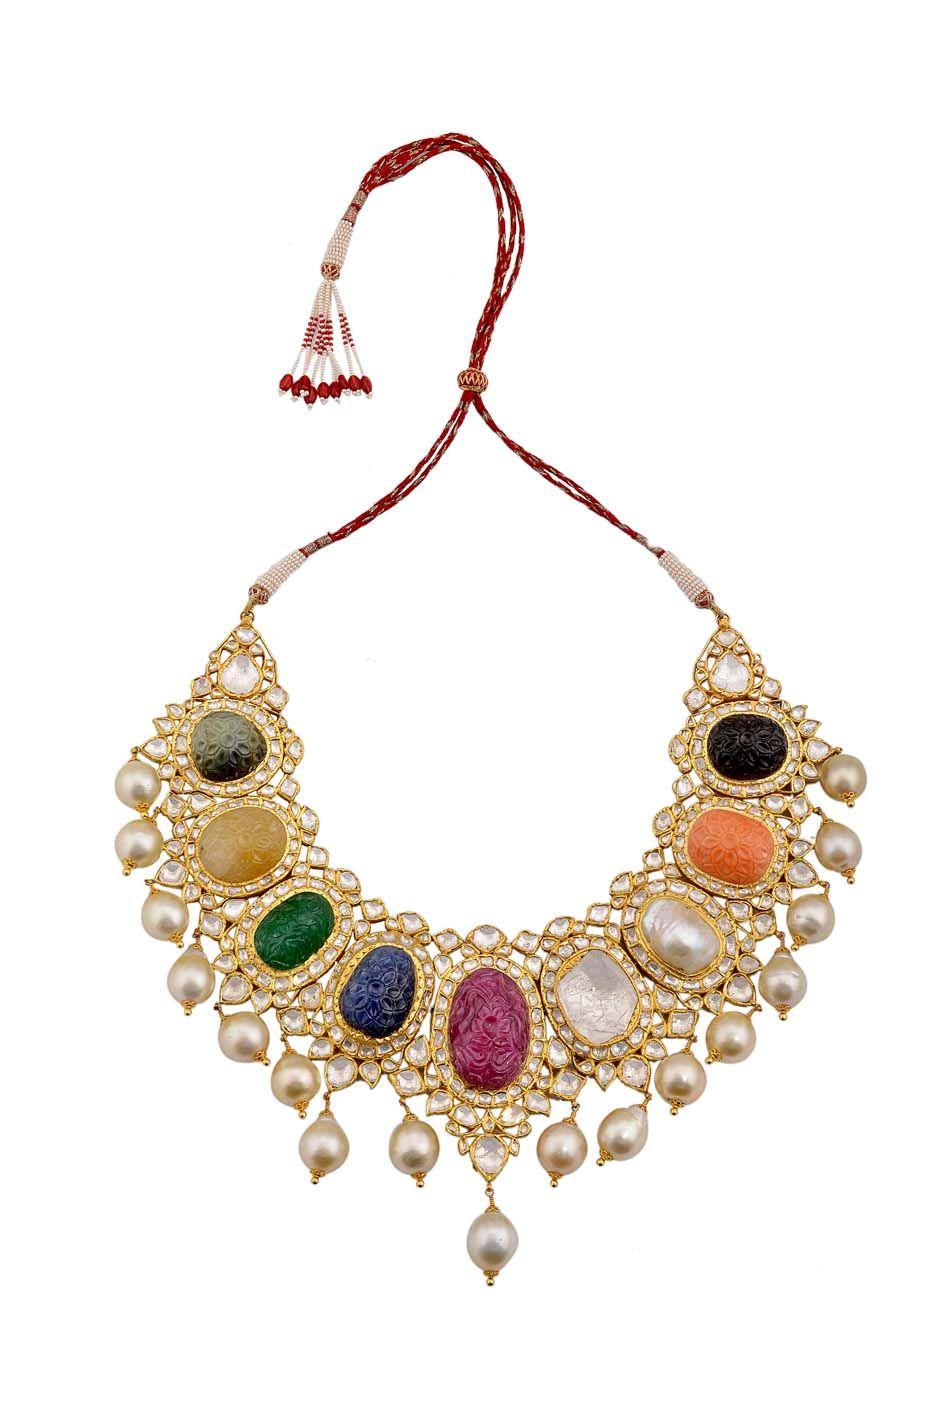 Amrapalius traditional navratna nine gem necklace featuring eight